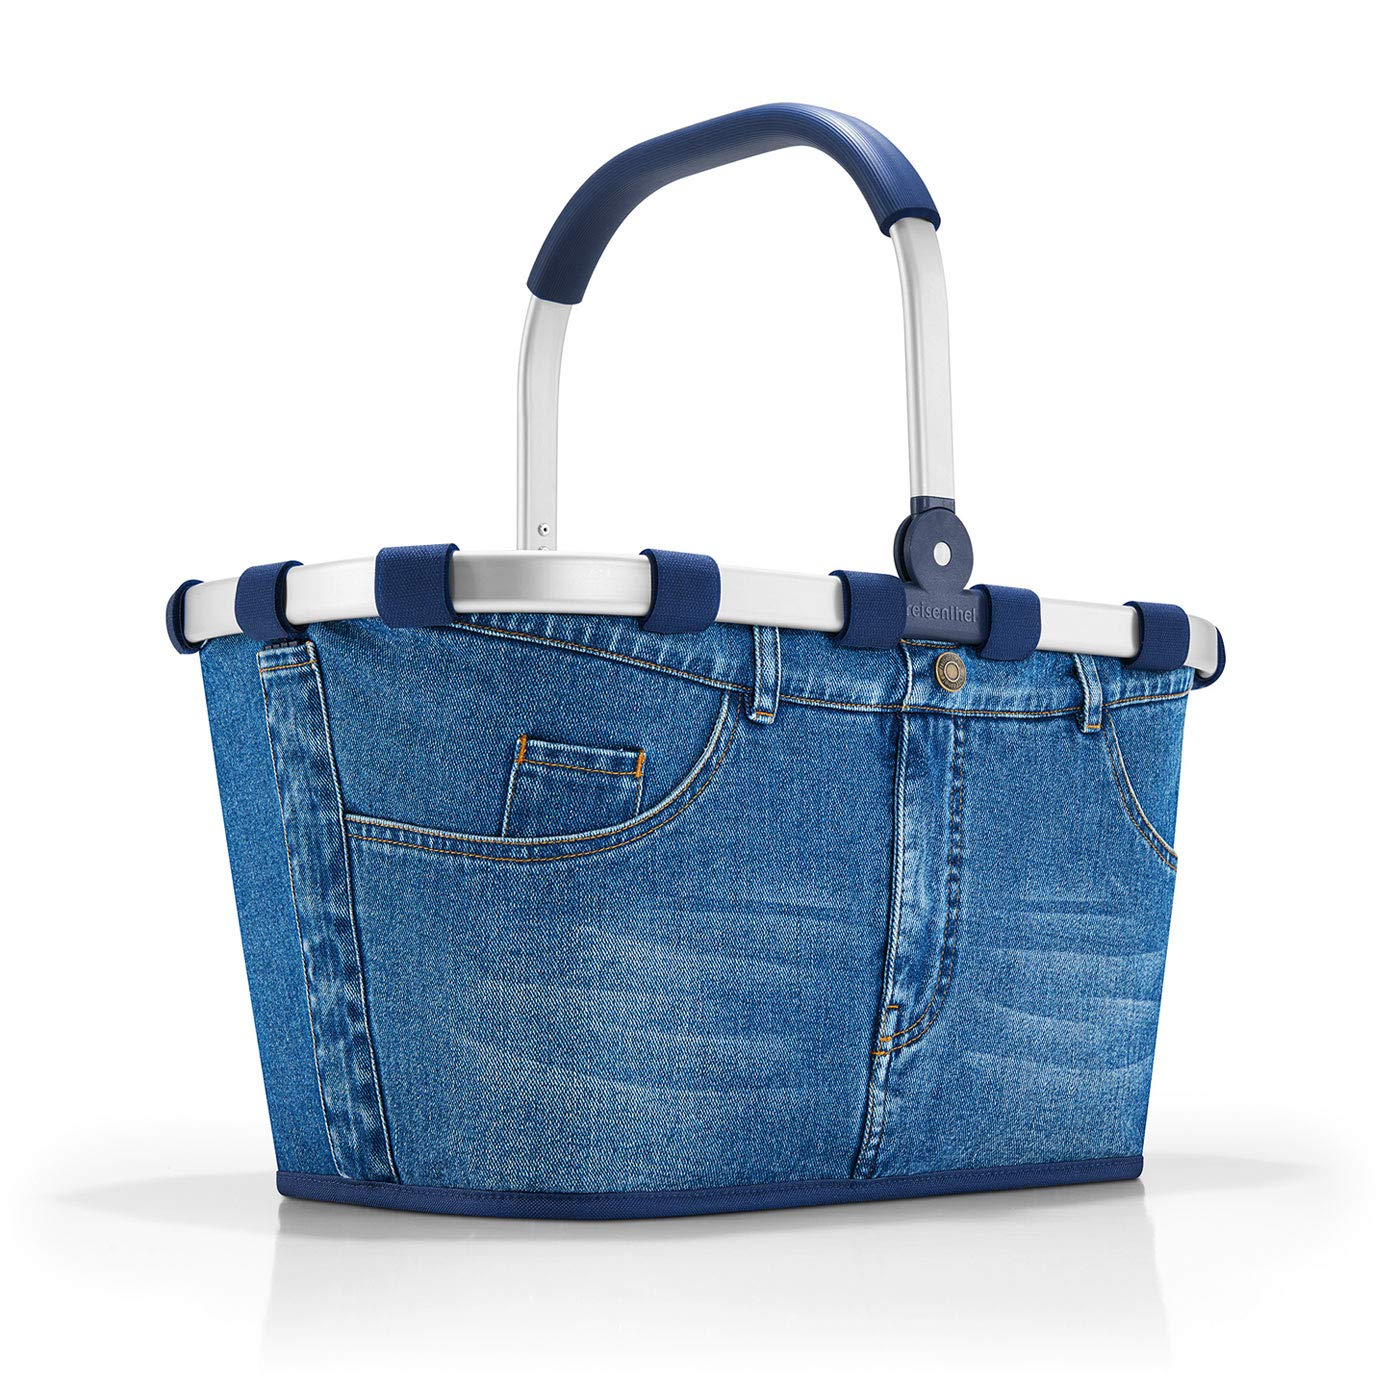 Reisenthel carrybag Jeans Sporttasche, 48 cm, 22 L, Blau BK4063